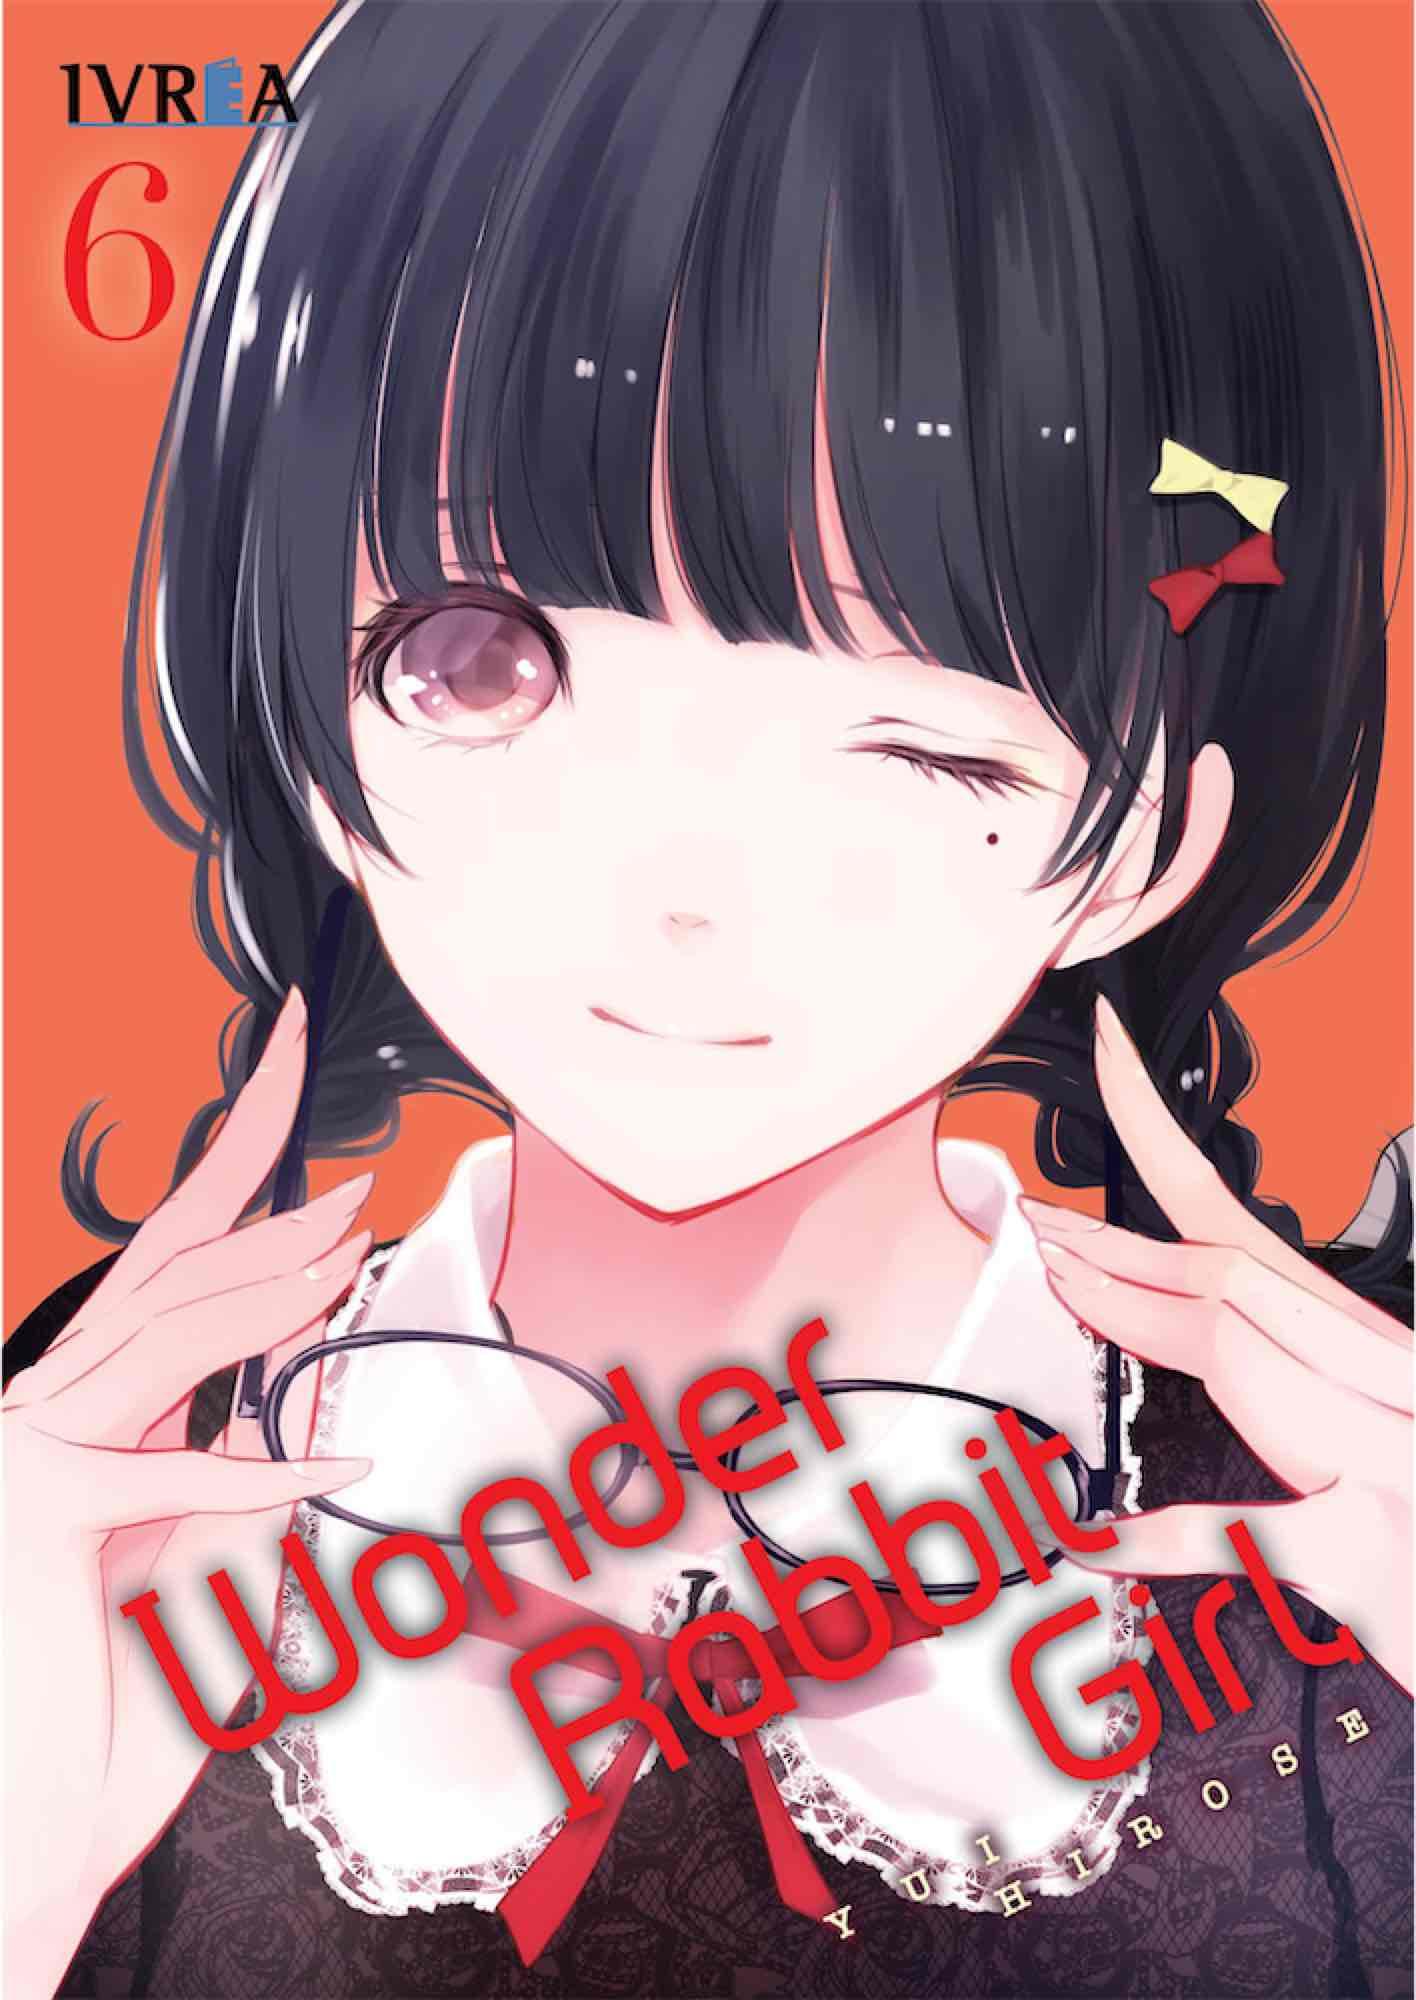 WONDER RABBIT GIRL 06 (COMIC)